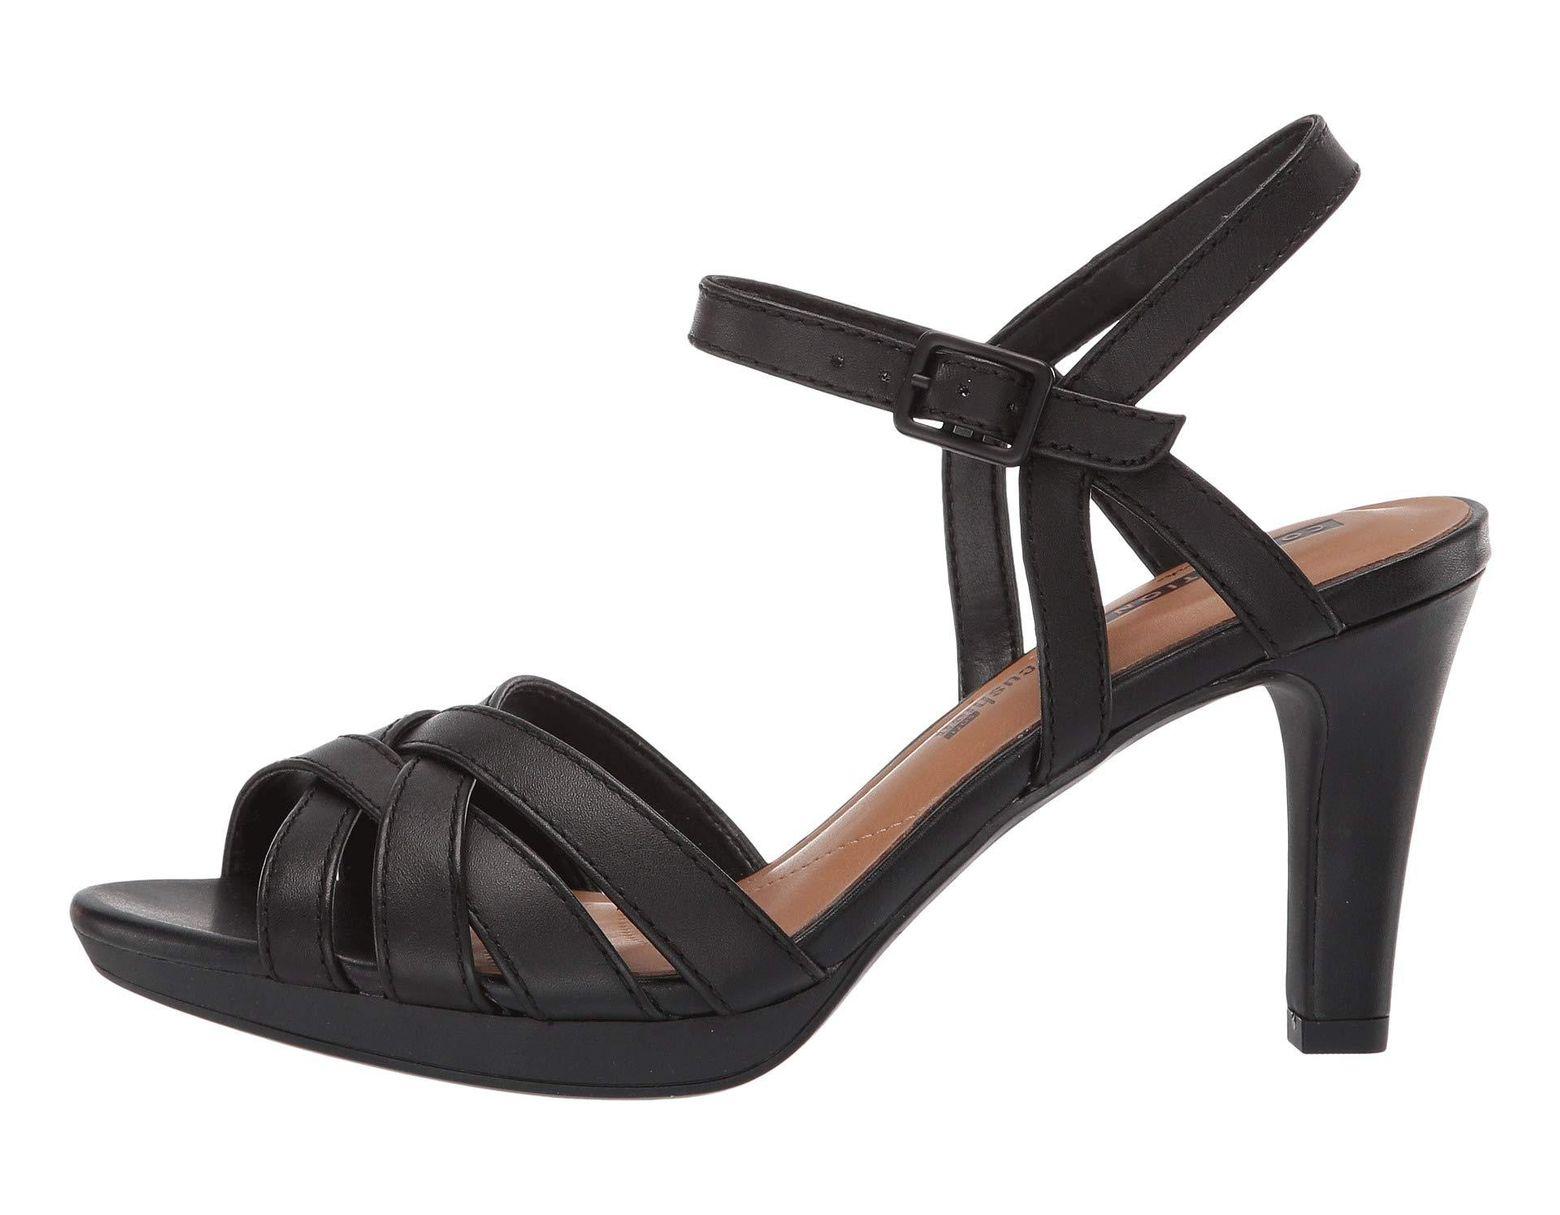 5bee9ee78204 Lyst - Clarks Adriel Wavy (black Leather) High Heels in Black